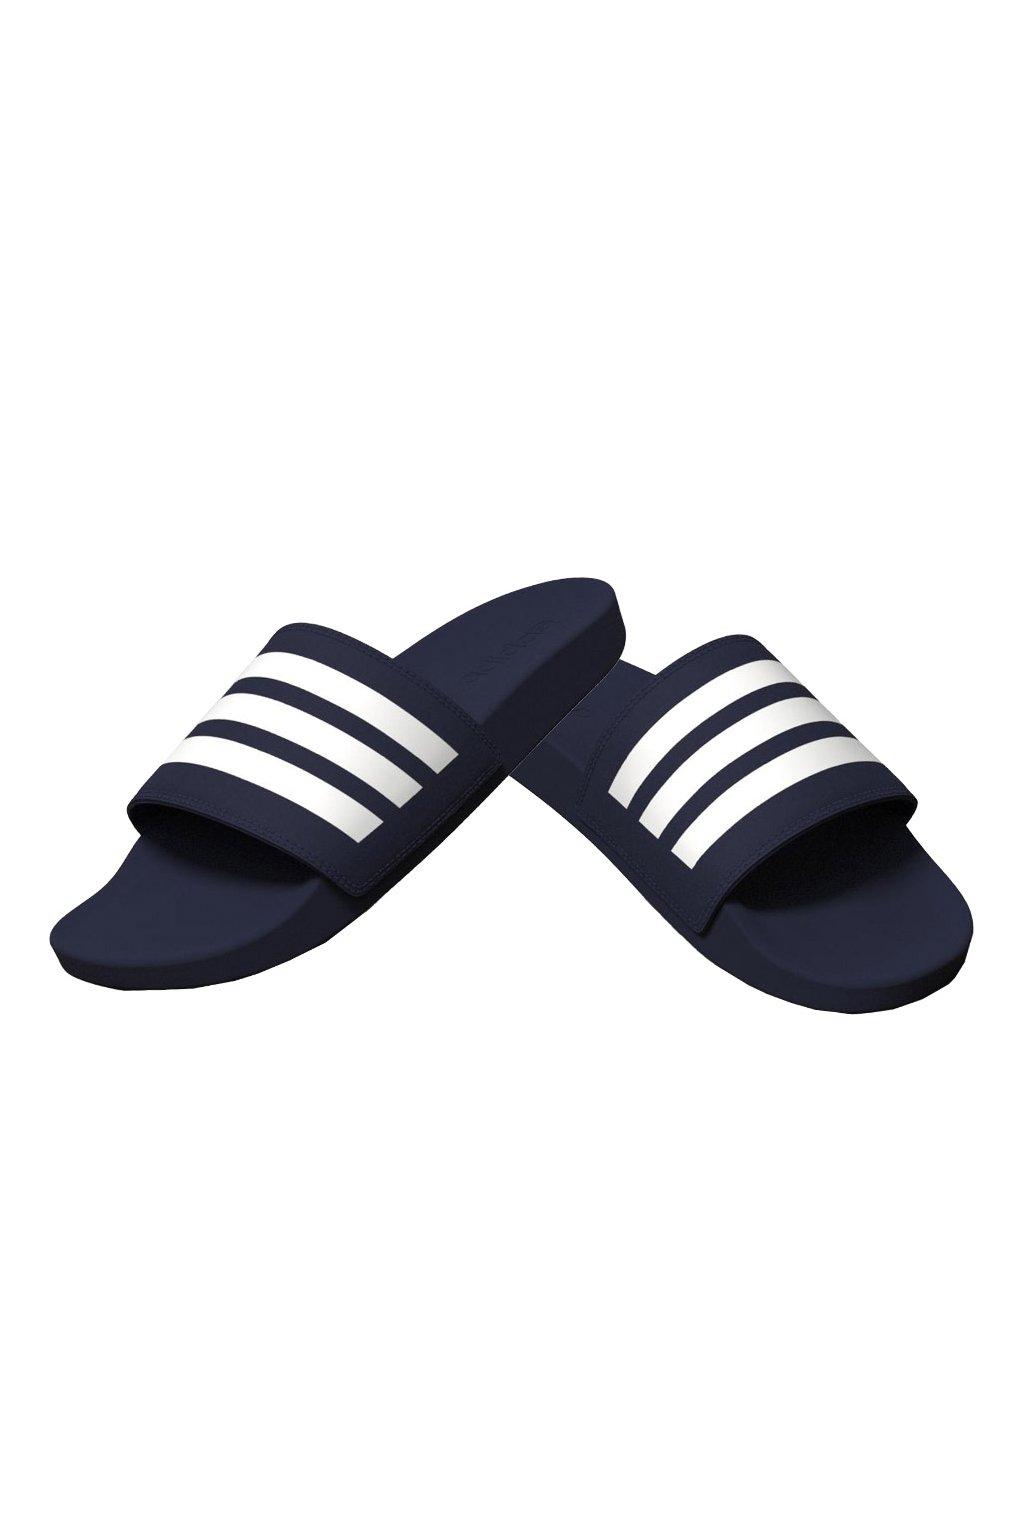 Šlapky Adidas Adilette Comfort námornícka modrá B42114